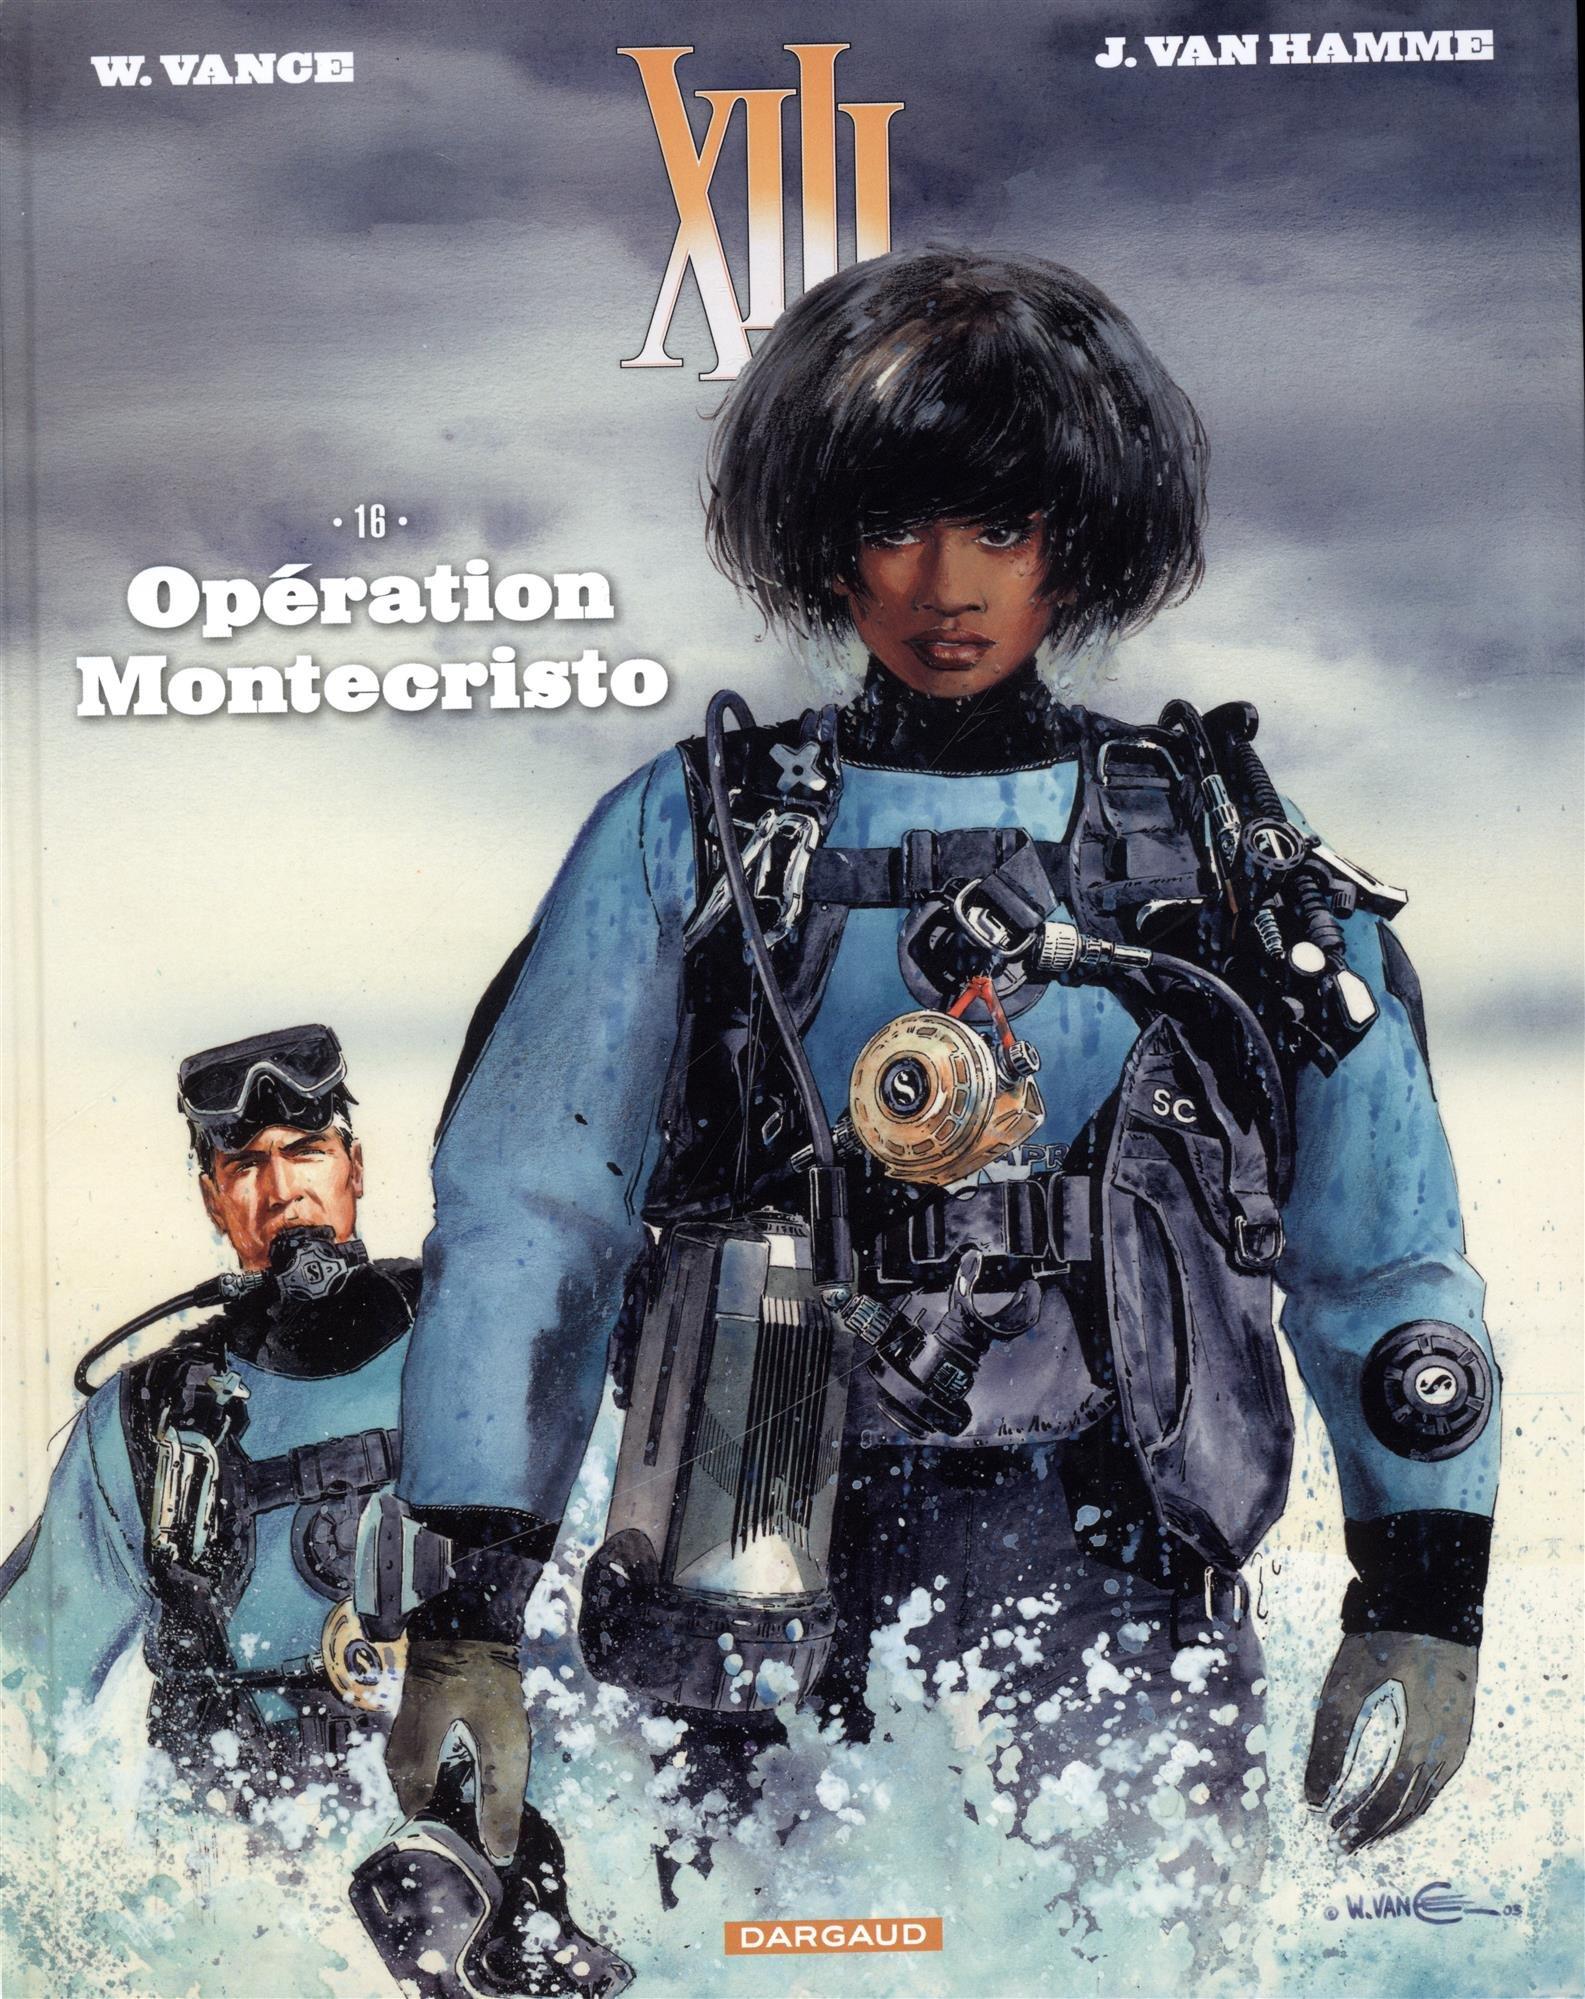 XIII - Nouvelle collection - tome 16 - Opération Montecristo Album – 13 octobre 2017 Van Hamme Jean Vance Dargaud 250506816X